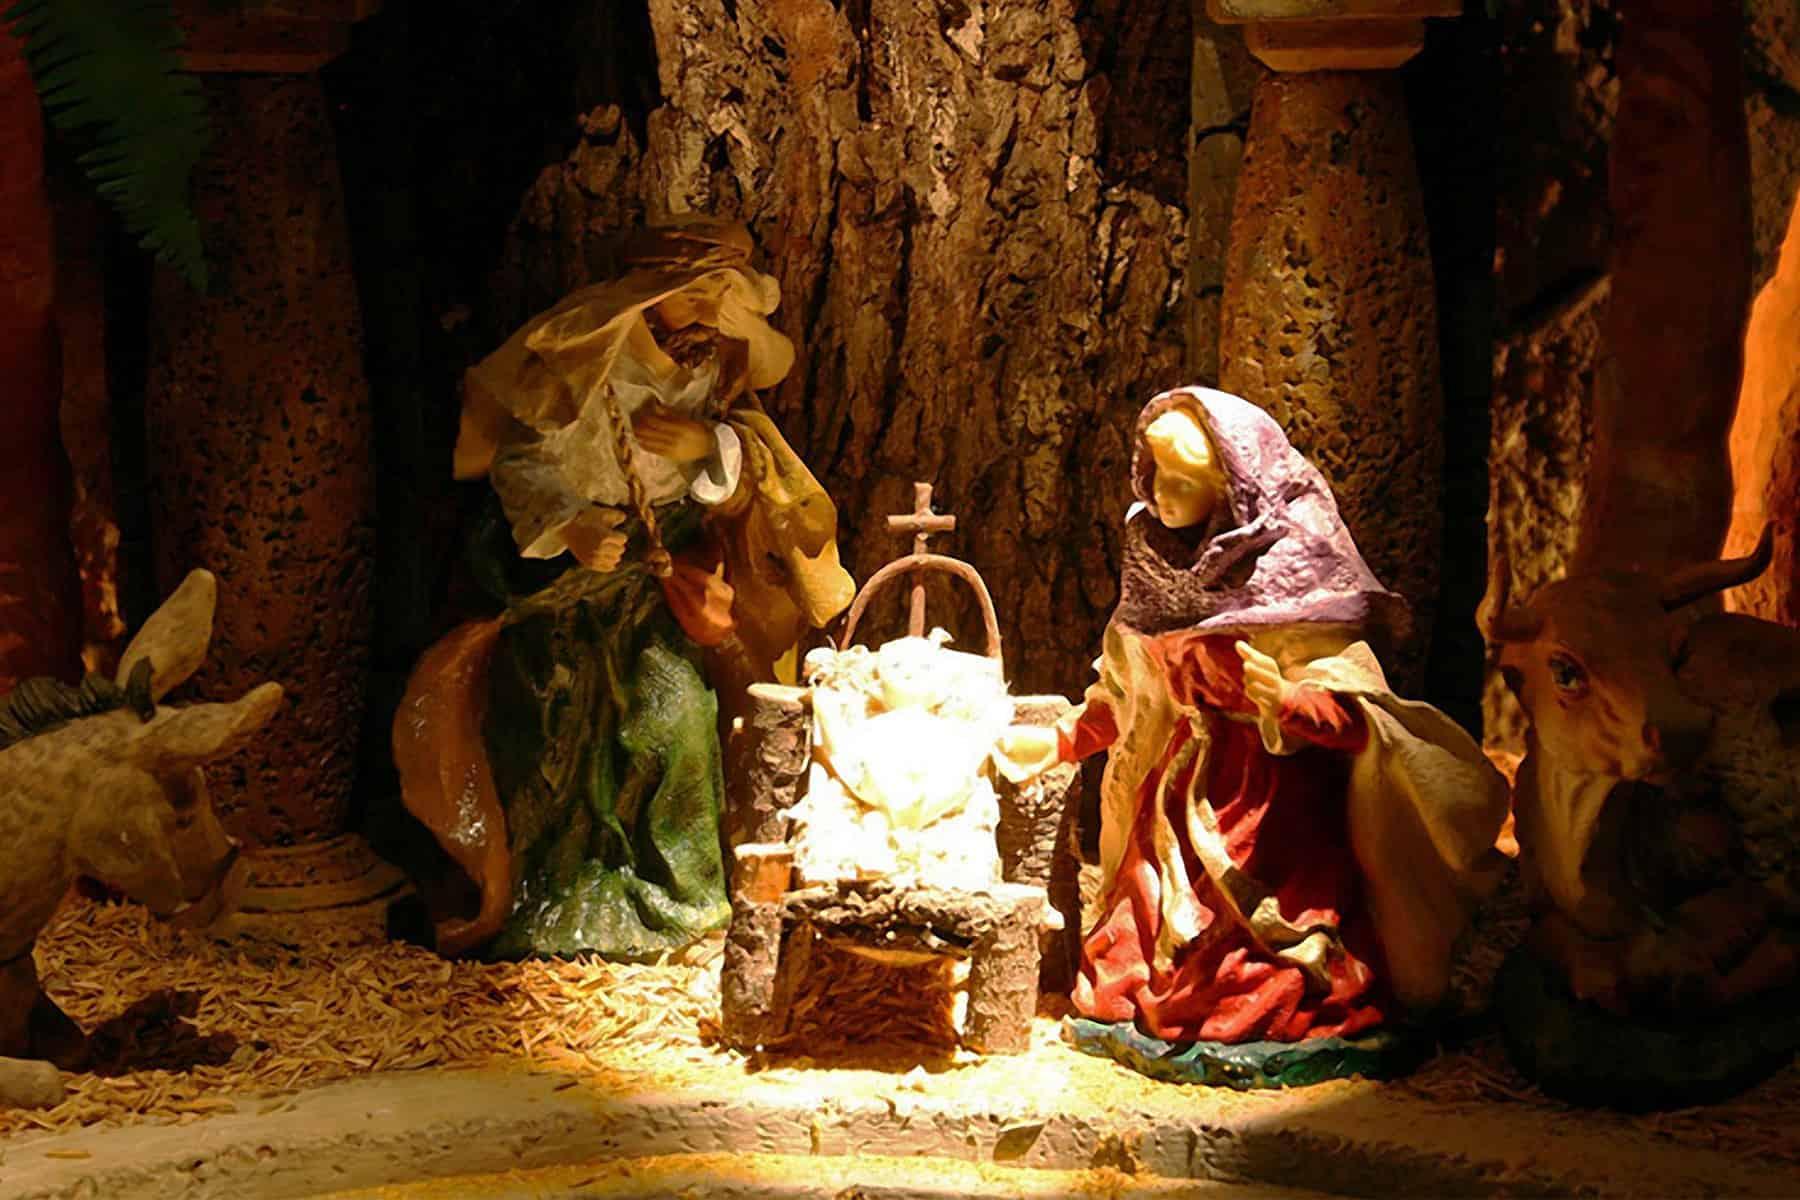 Costa Rica holidays: A nativity scene